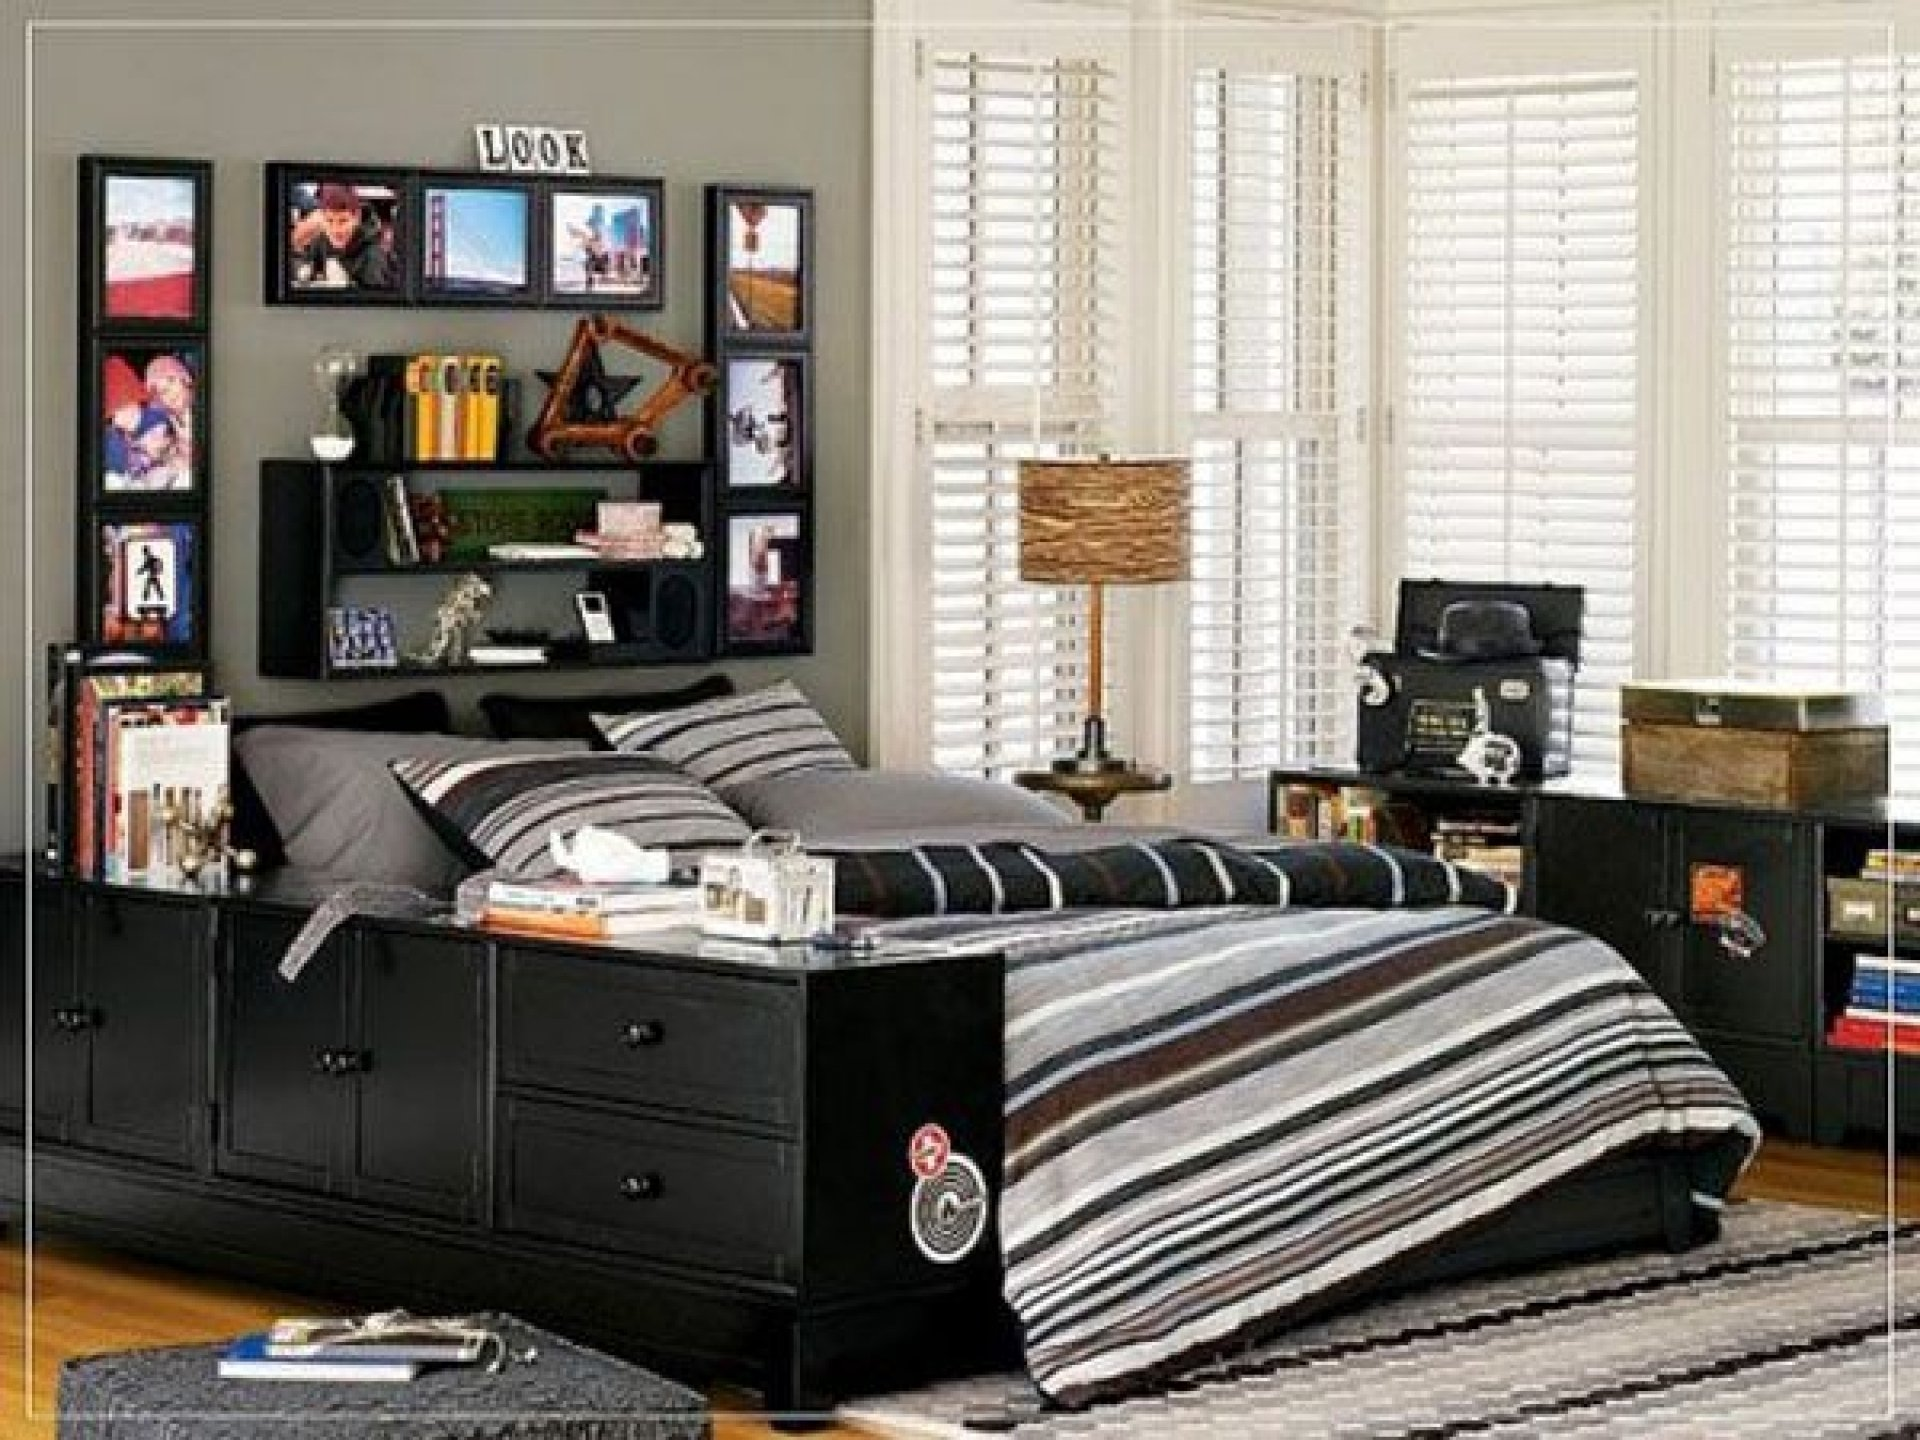 10 Beautiful Cool Room Ideas For Teenage Guys collection in small bedroom ideas for teenage guys for house decor 2020